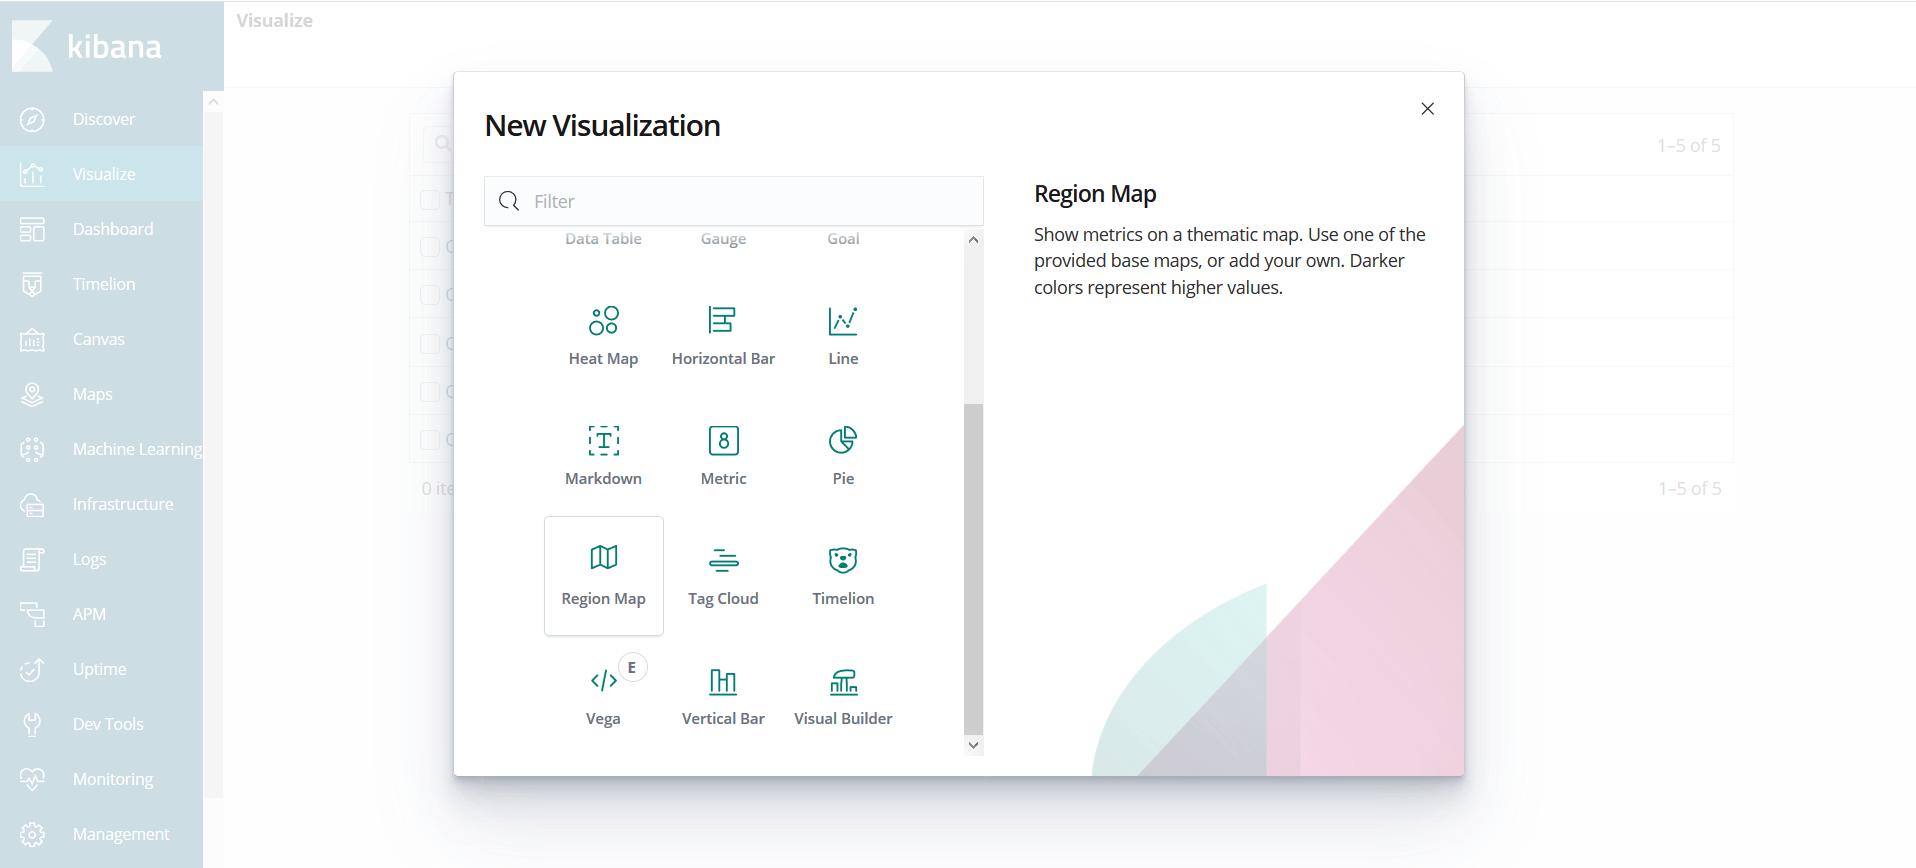 Visualize list